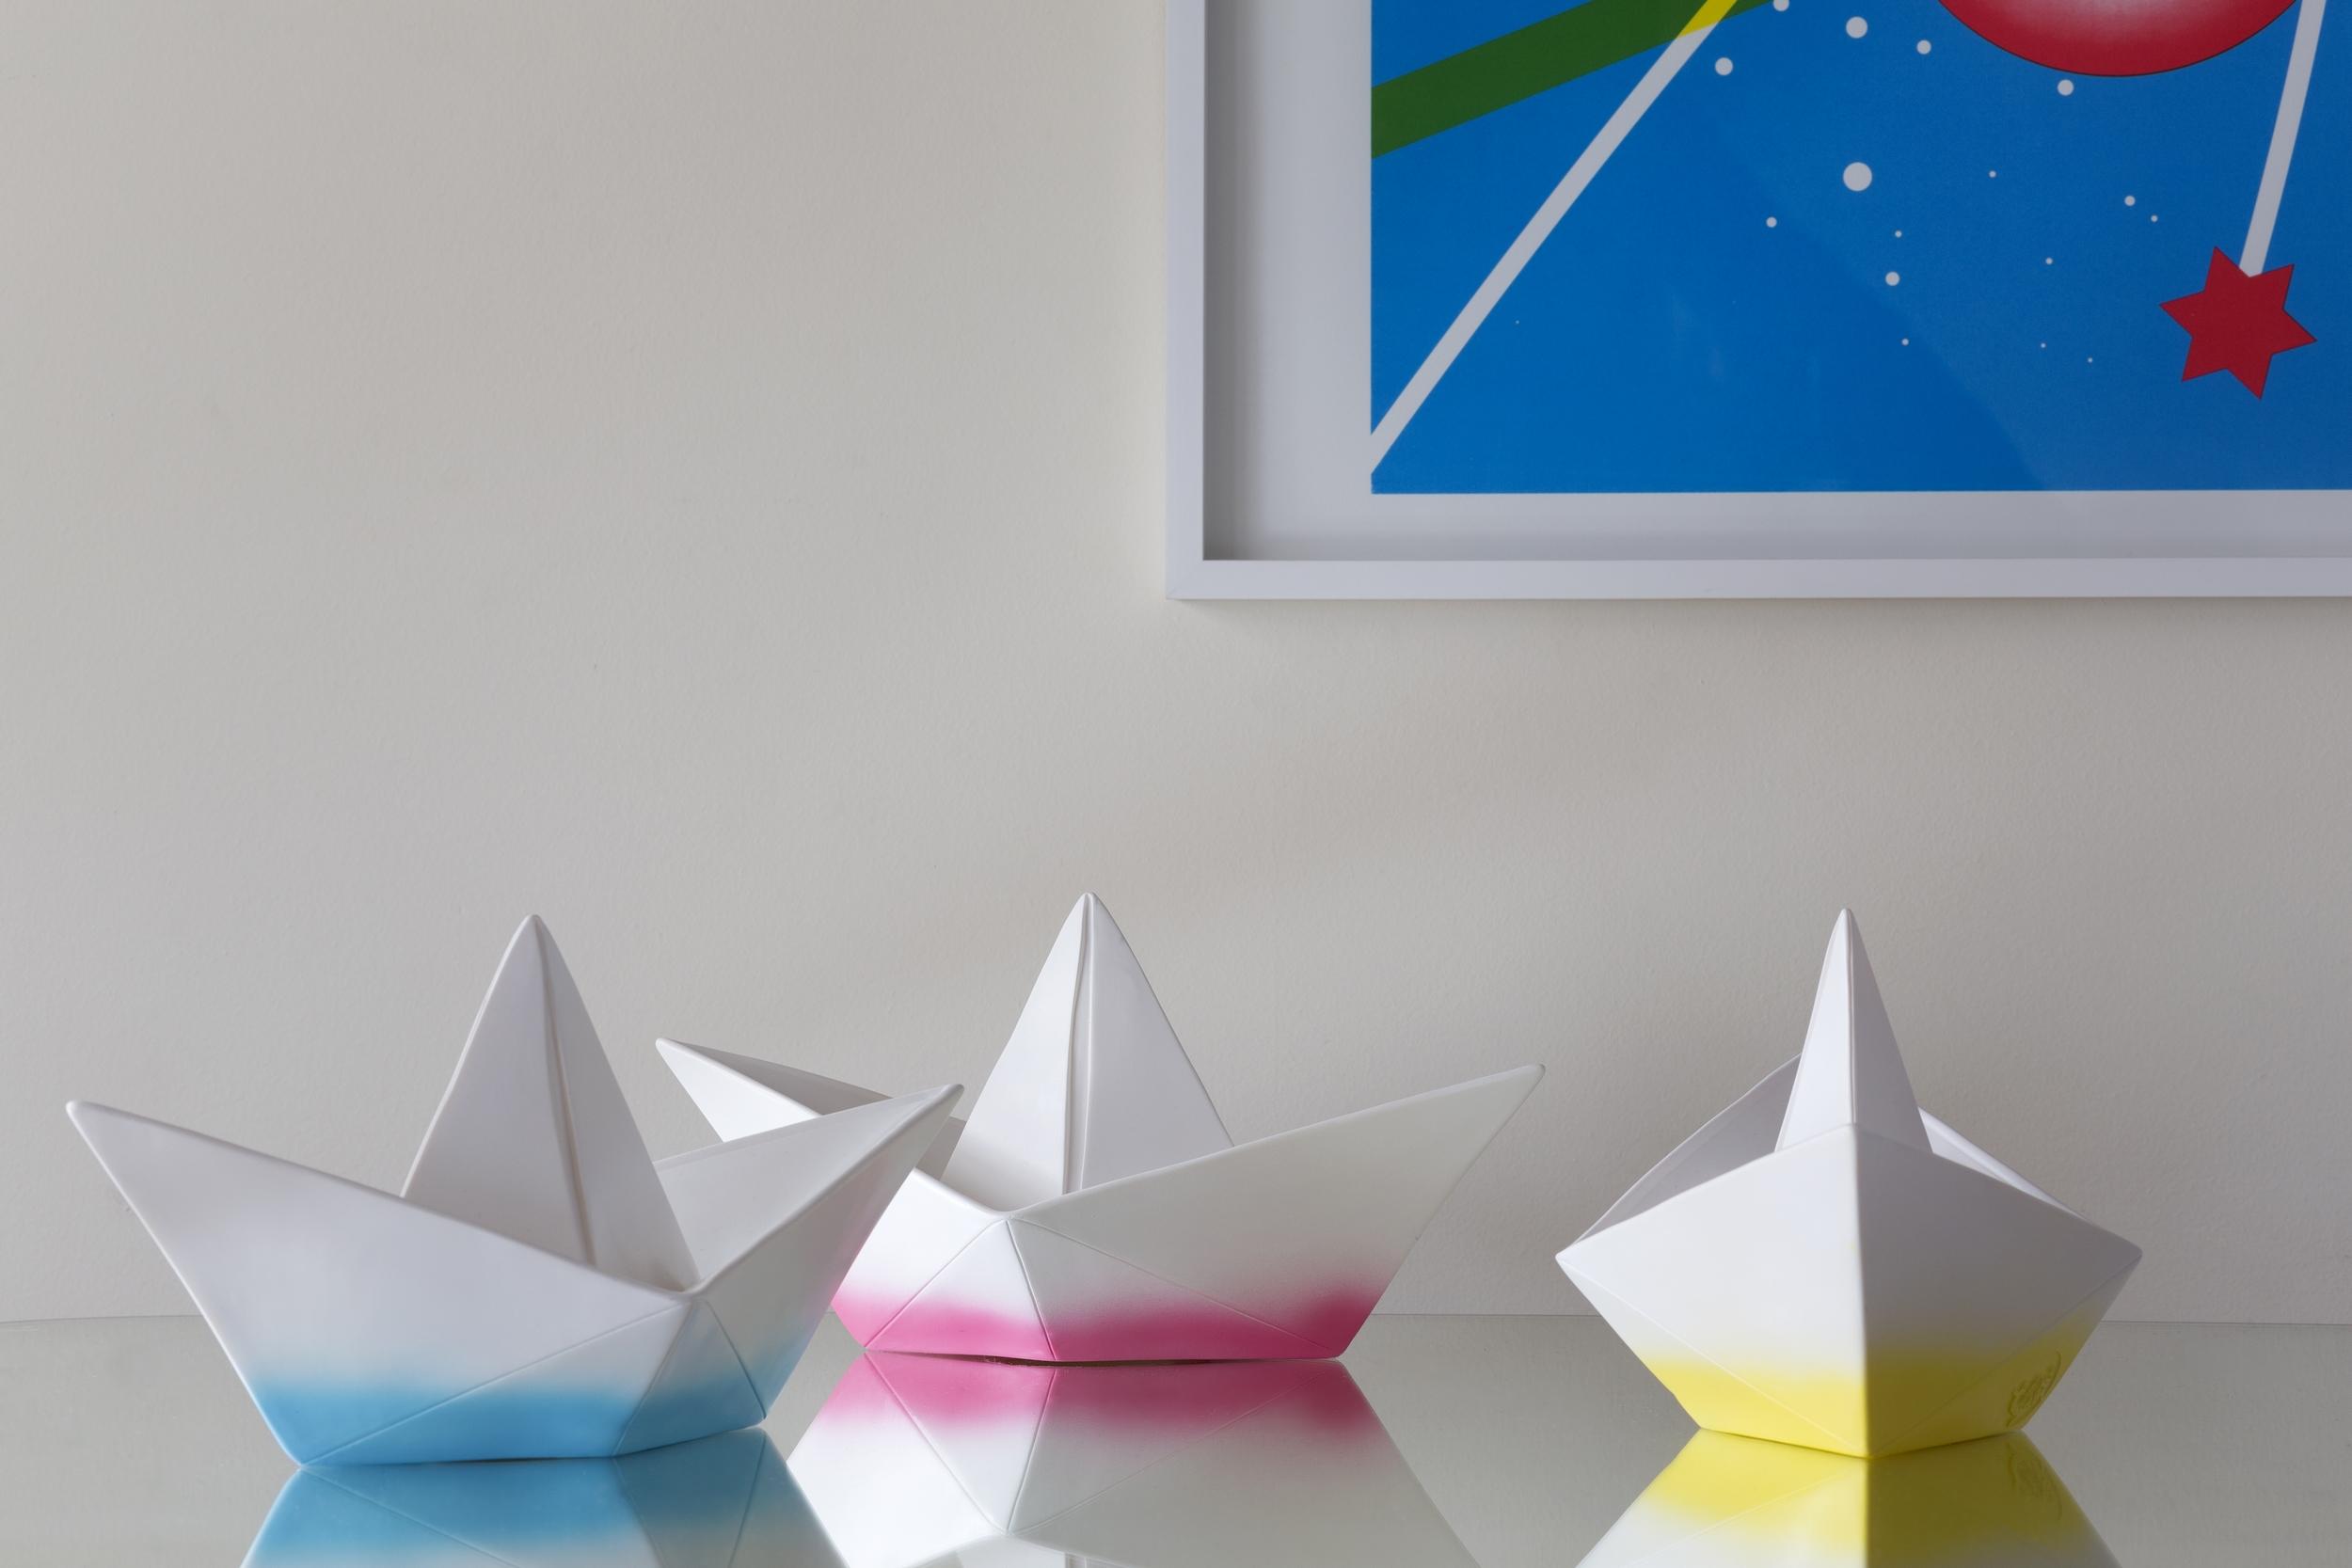 lampy-goodnight-light-veilleuses-bateau-origami